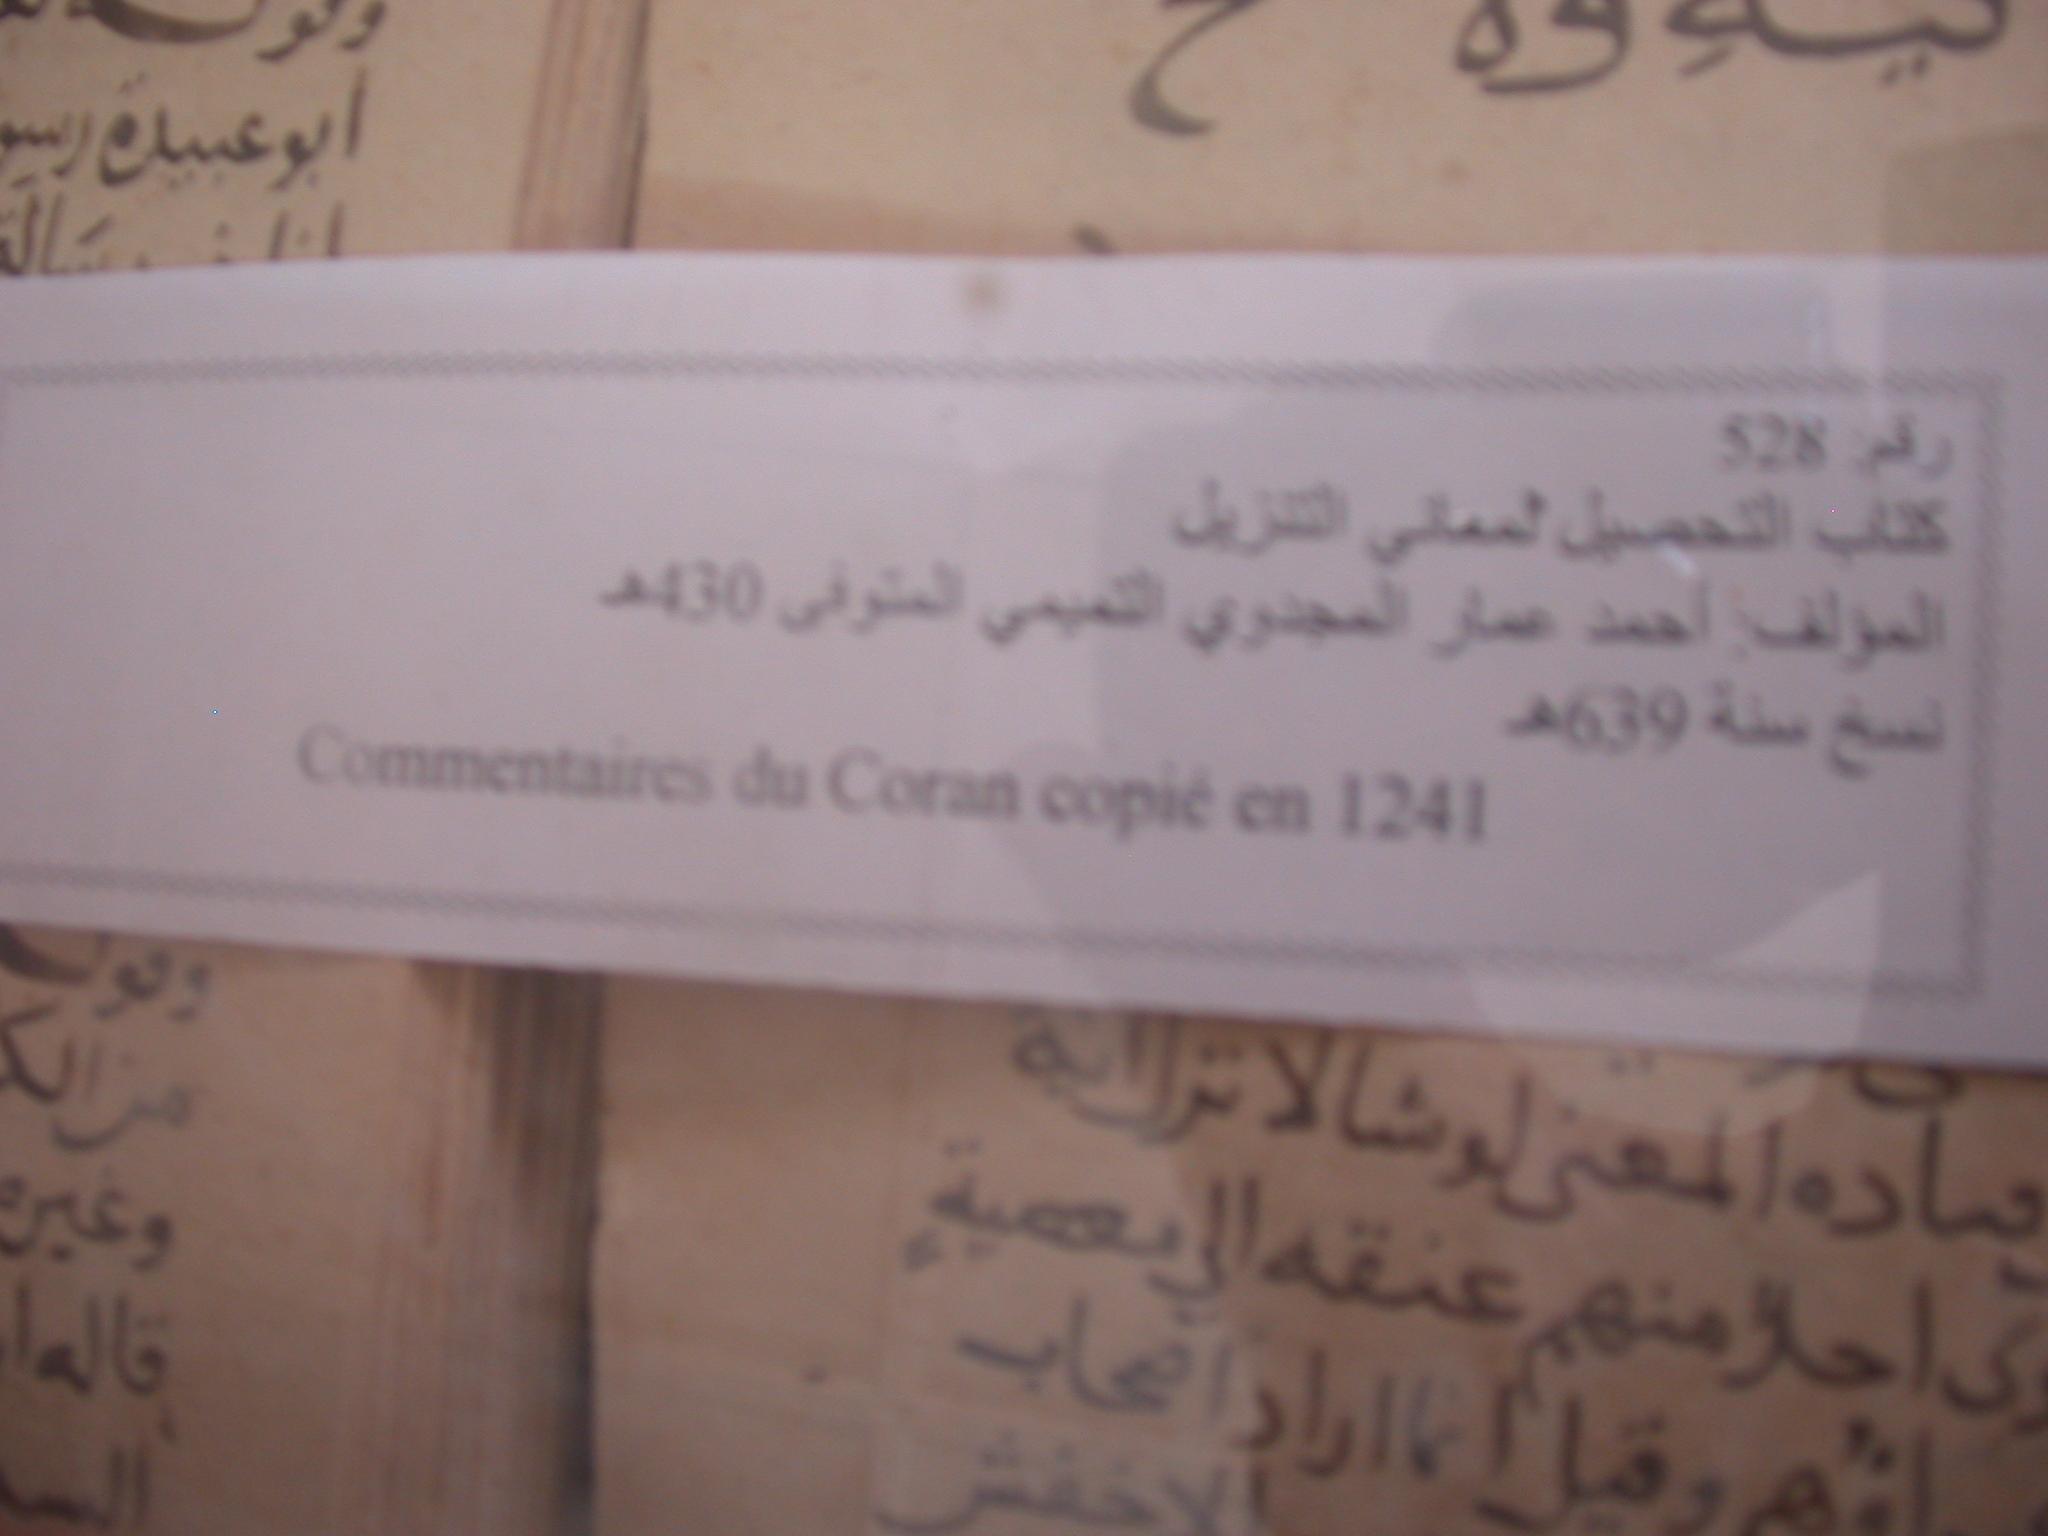 Manuscript, Koran Commentaries Copied in 1241, Detail, Ahmed Baba Institute, Institut des Hautes Etudes et de Recherches Islamiques, Timbuktu, Mali